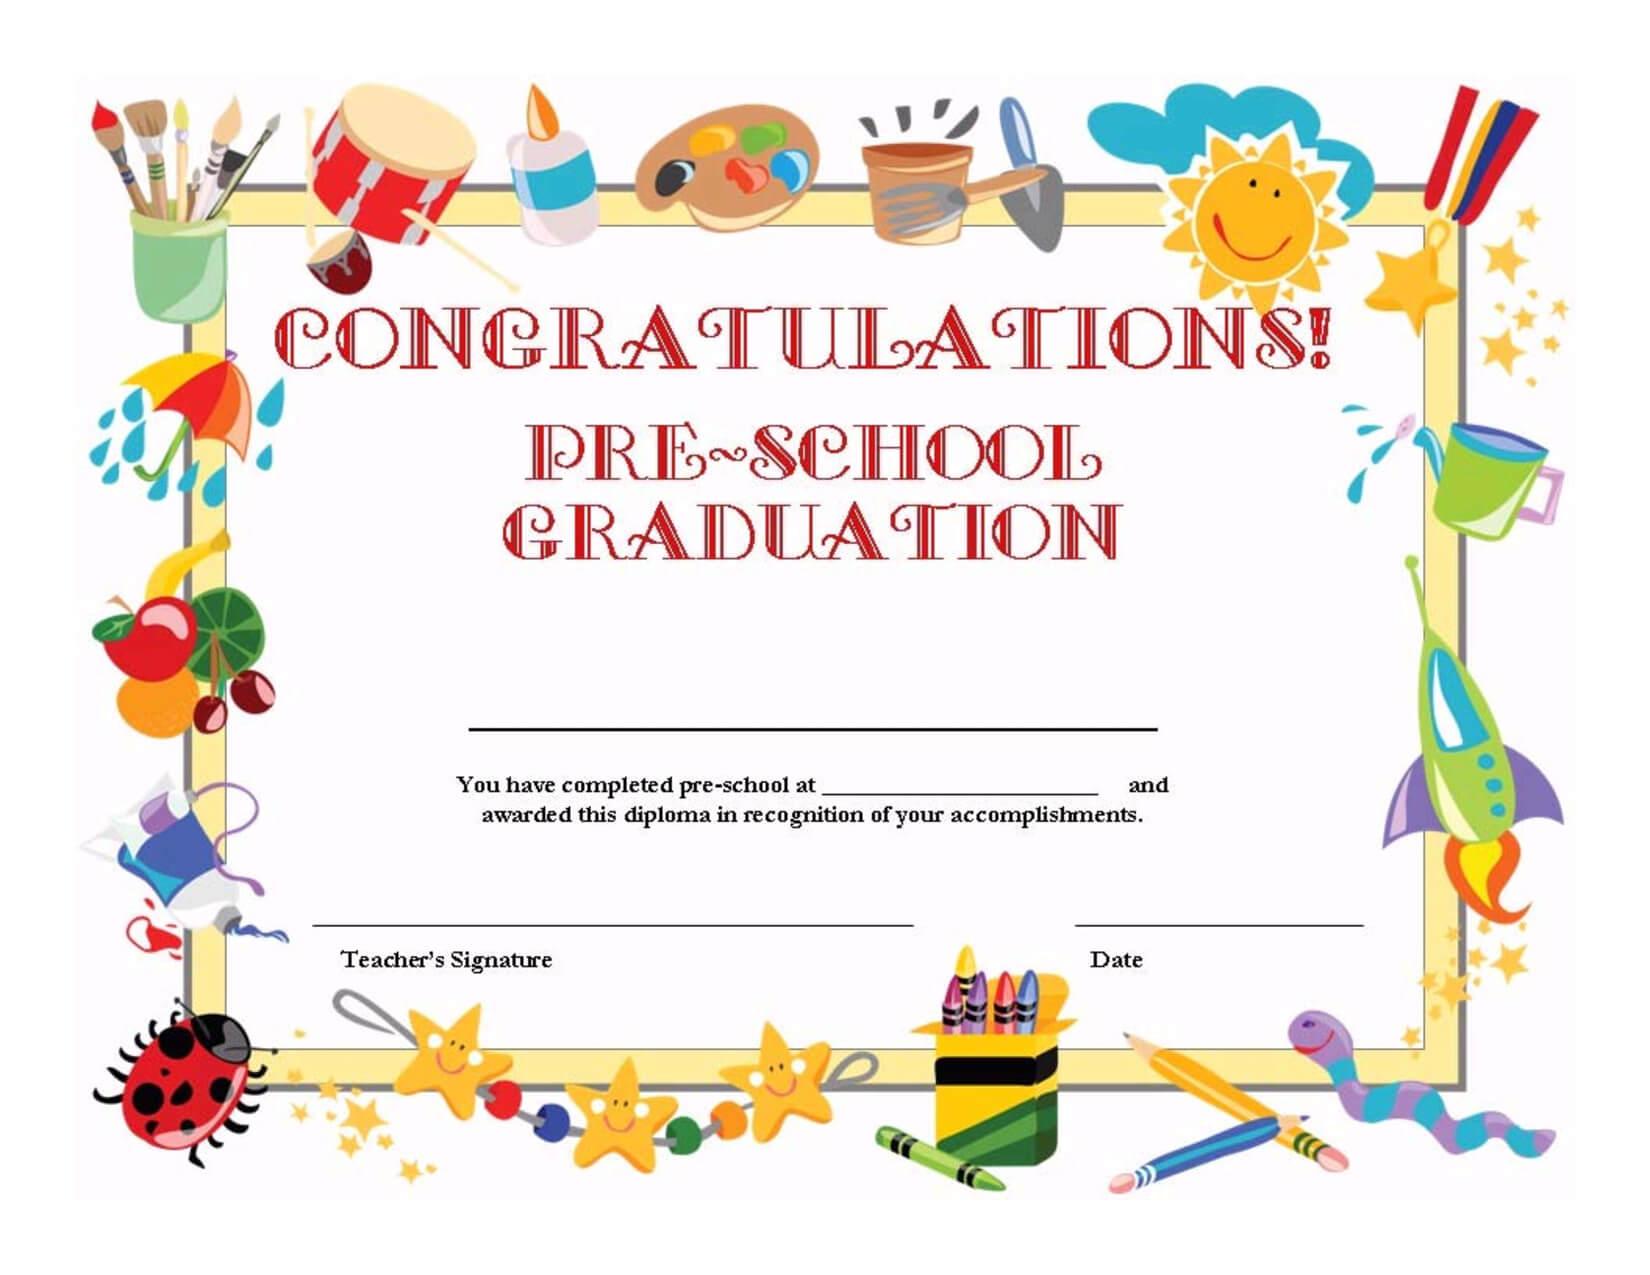 Preschool Graduation Certificate Template Free Intended For Classroom Certificates Templates